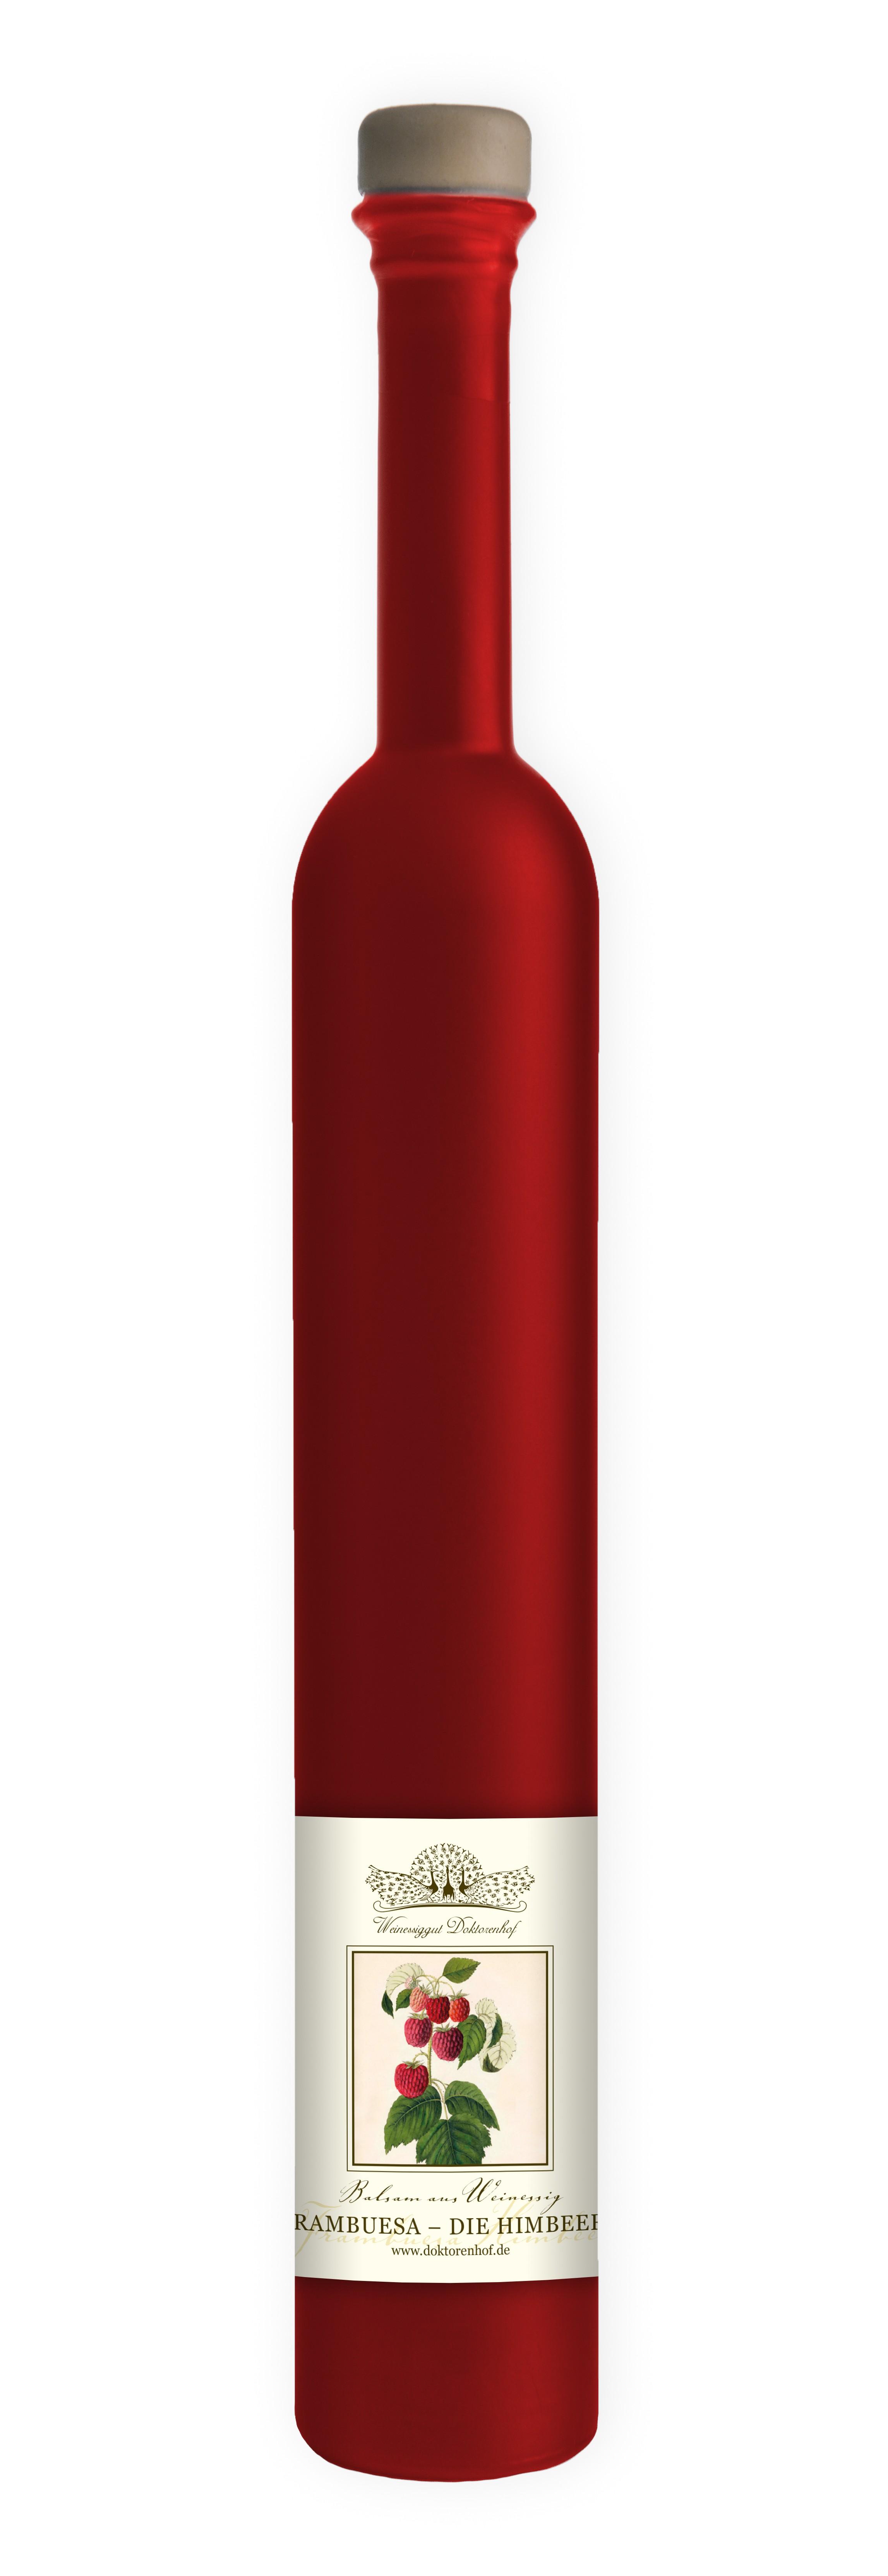 Frambuesa »Die Himbeere« 125 ml Pavoflasche